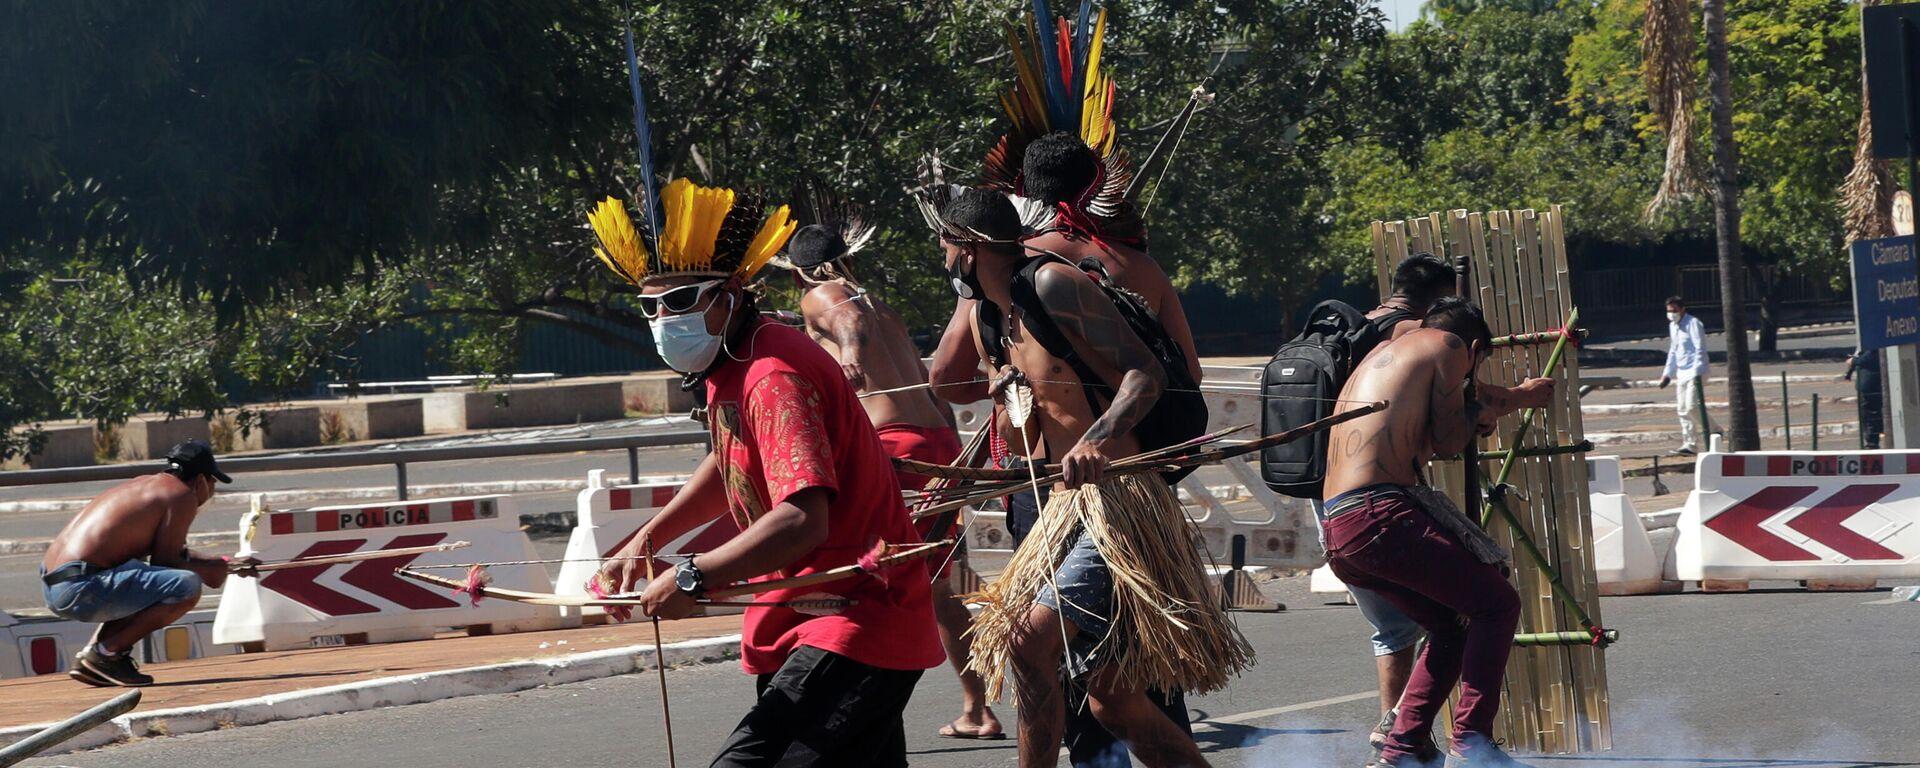 Protestas de indígenas de Brasil - Sputnik Mundo, 1920, 23.06.2021